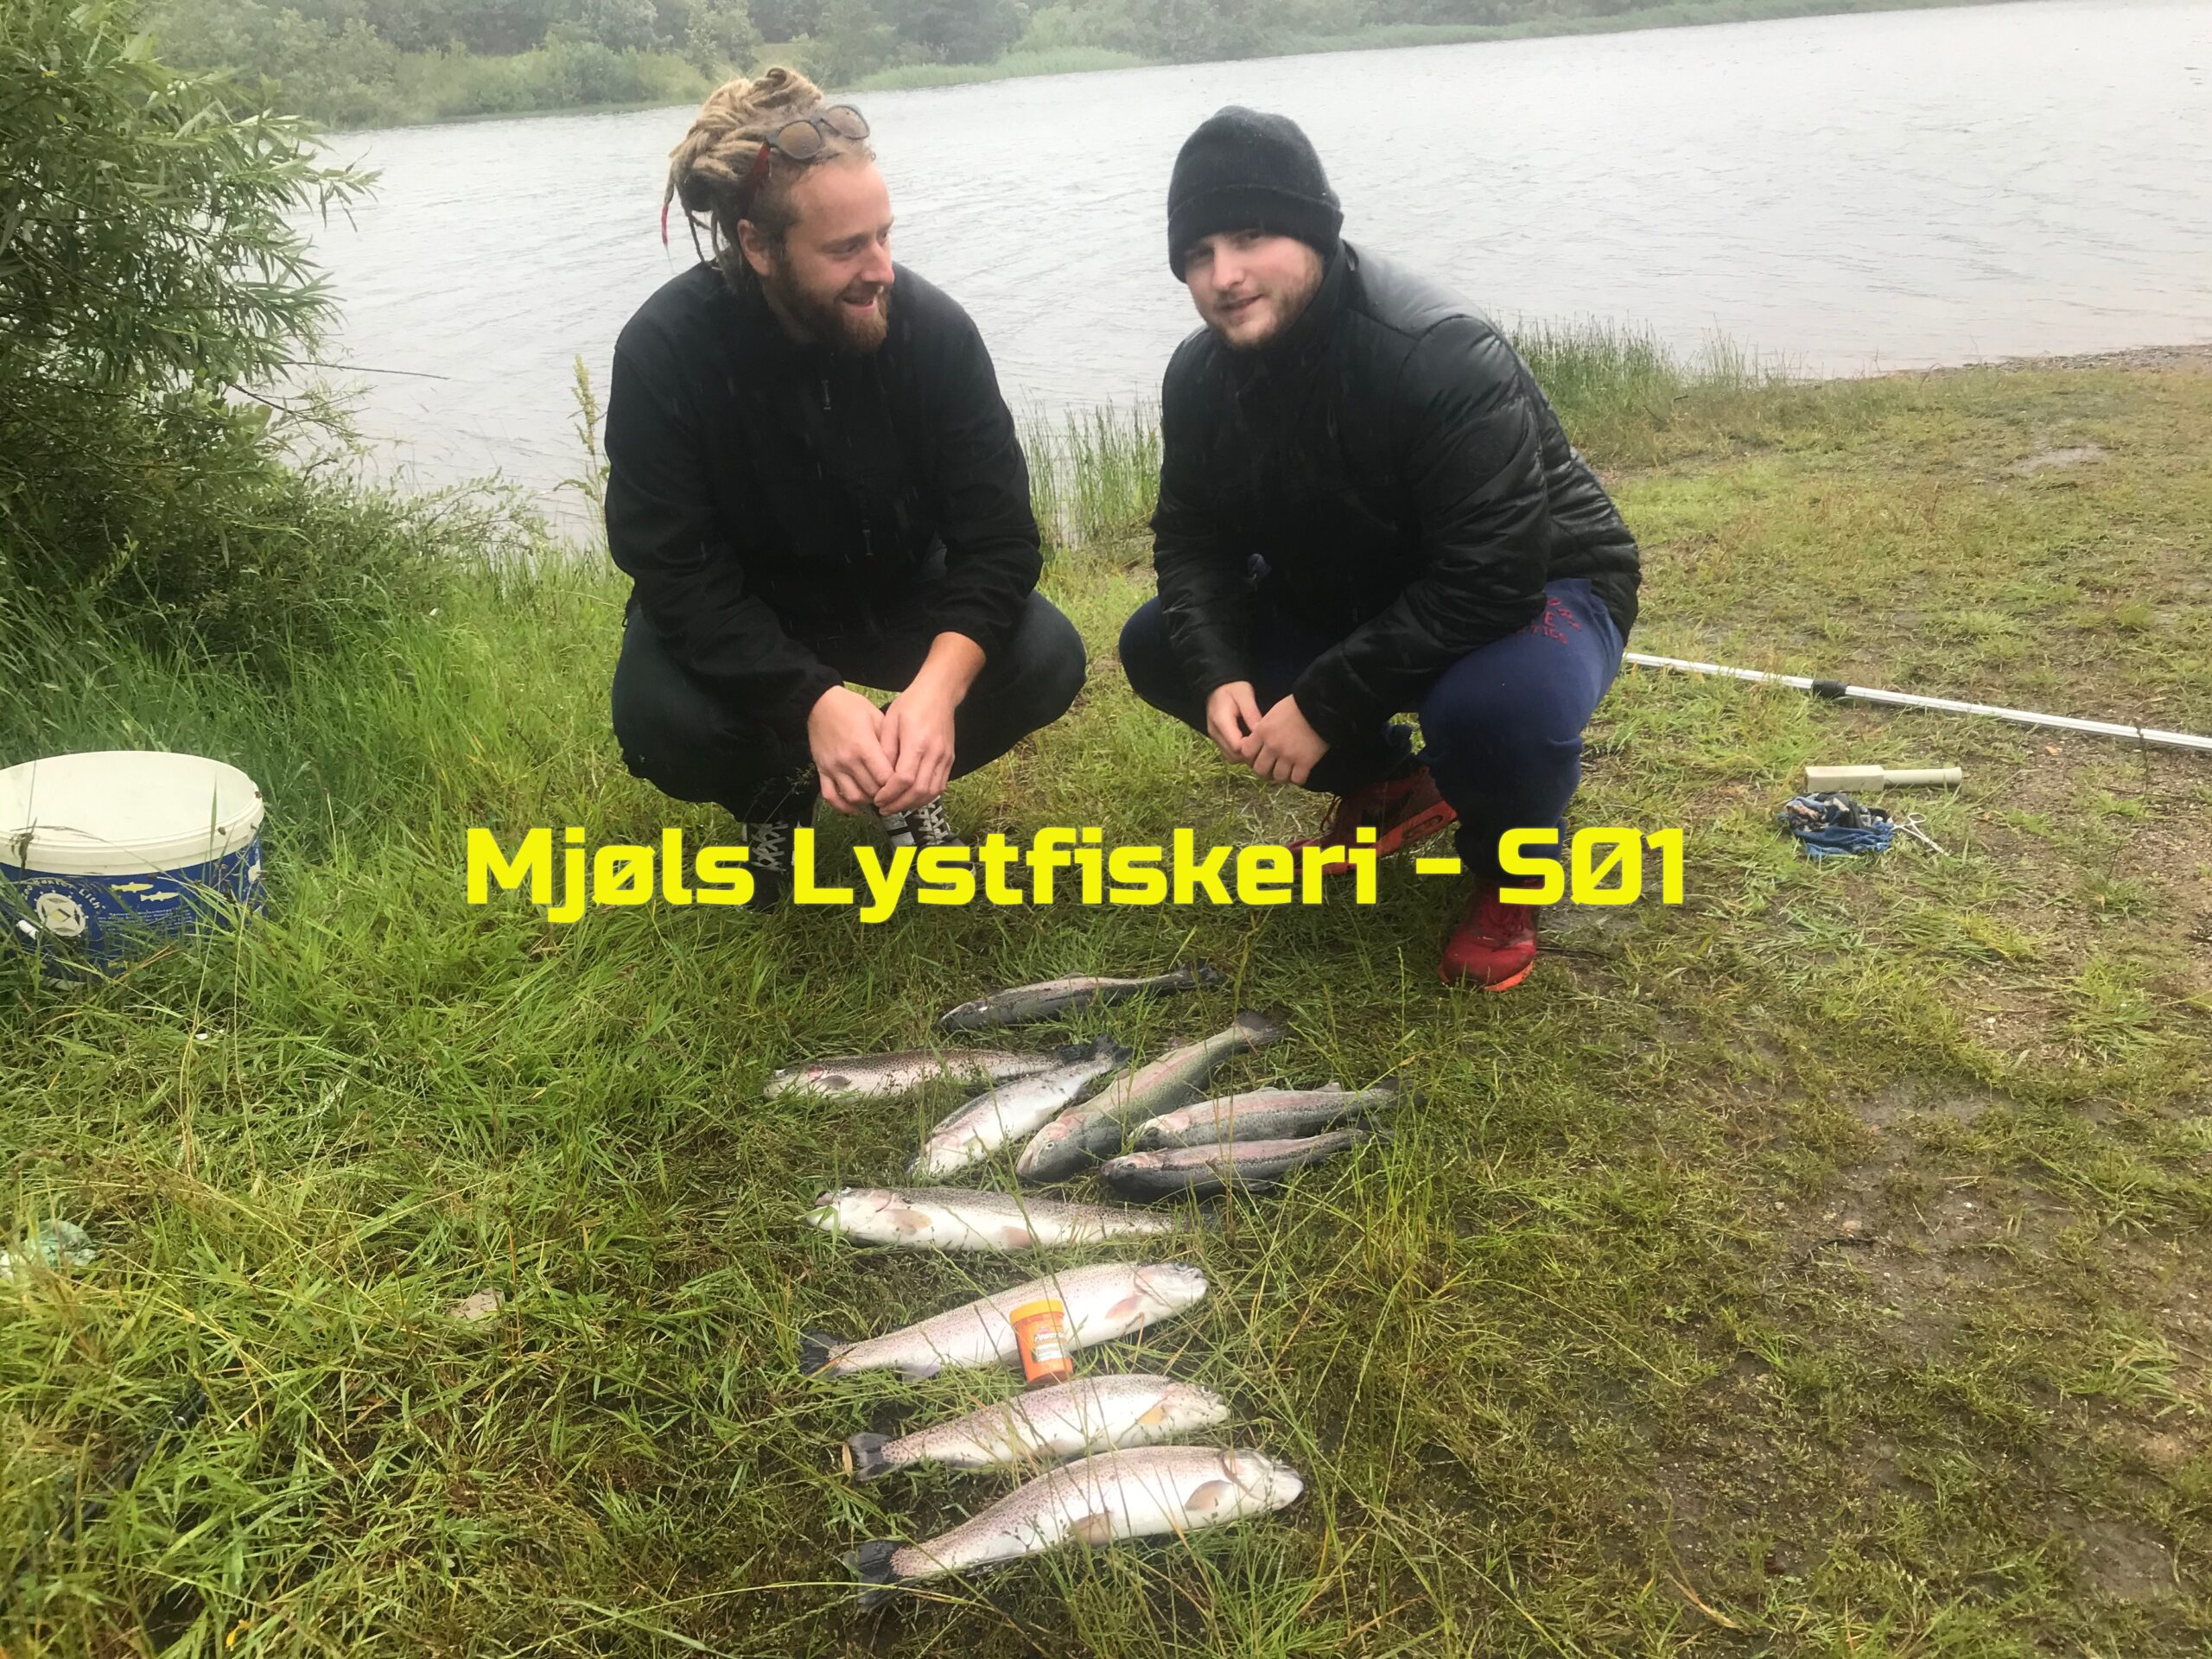 Mjøls Lystfiskeri – SØ1 – De købte ekstra kort